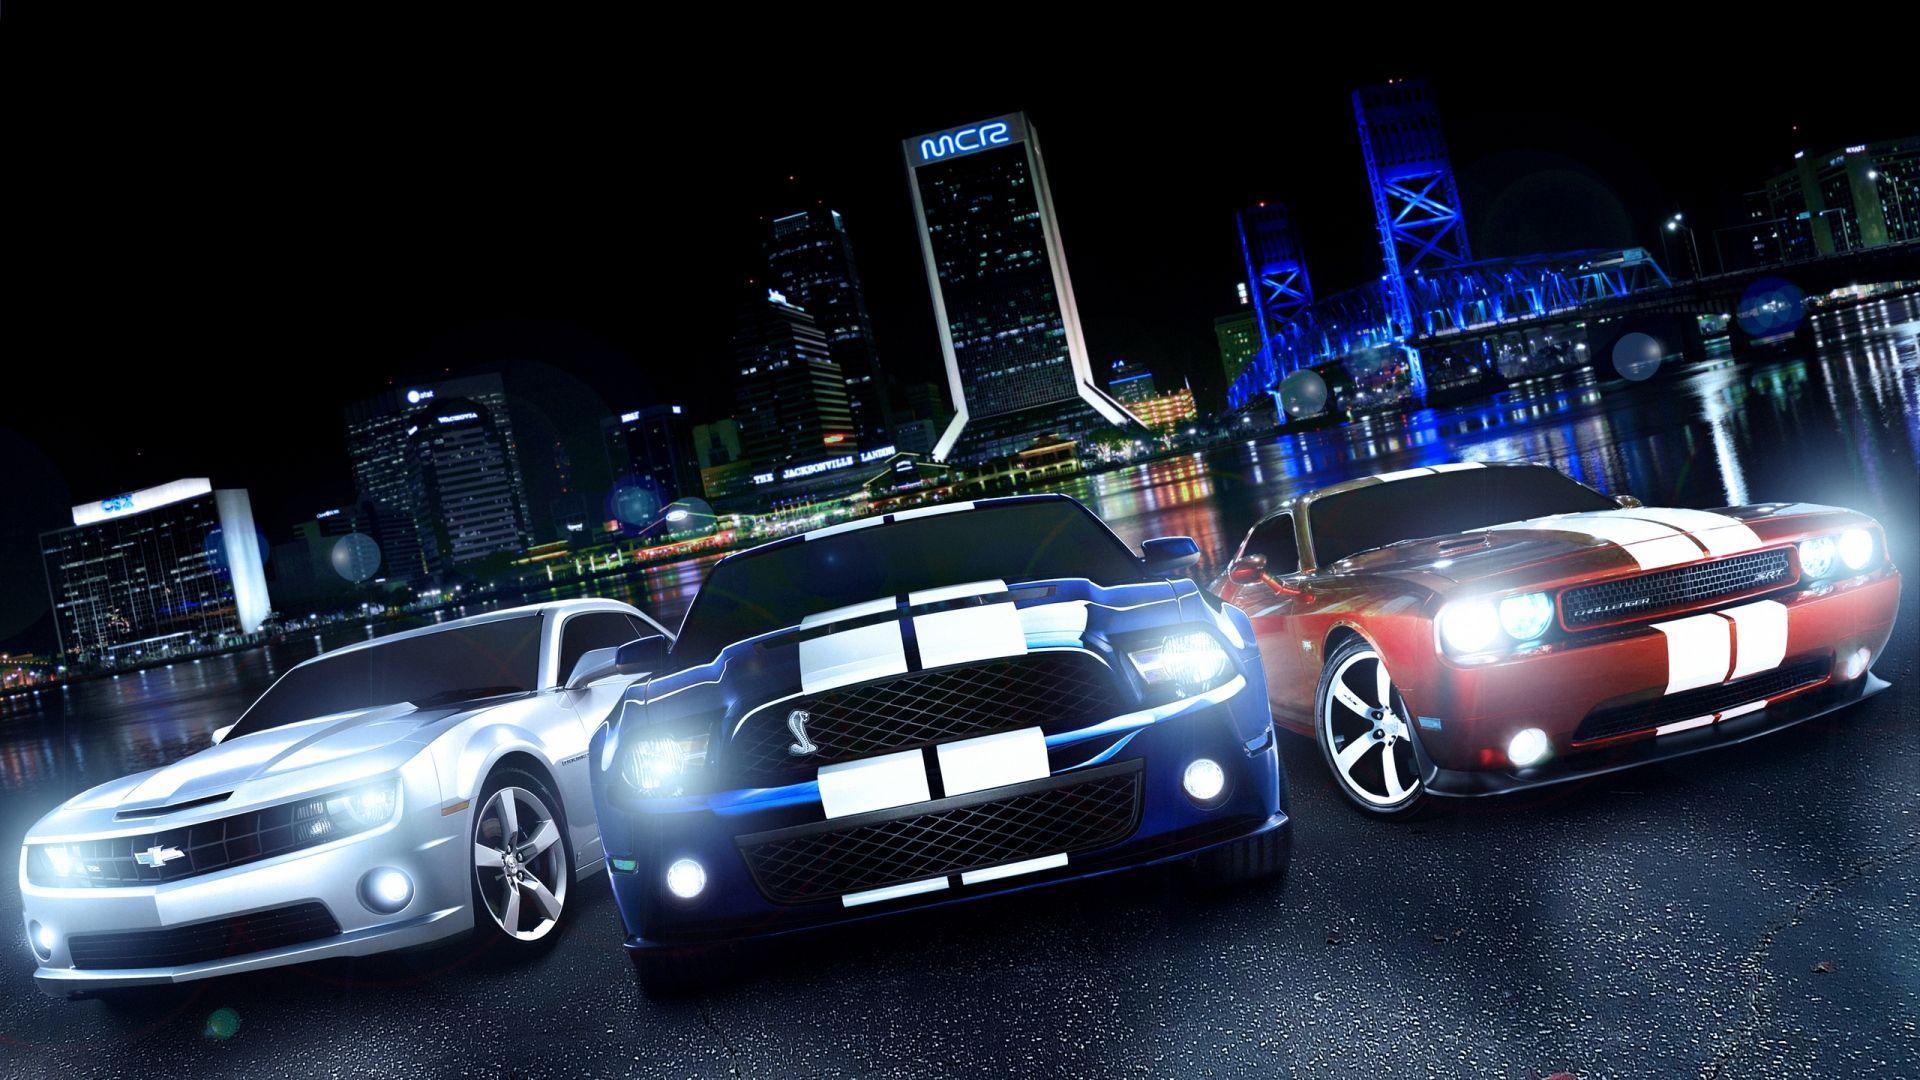 Automotive wallpaper picture hd